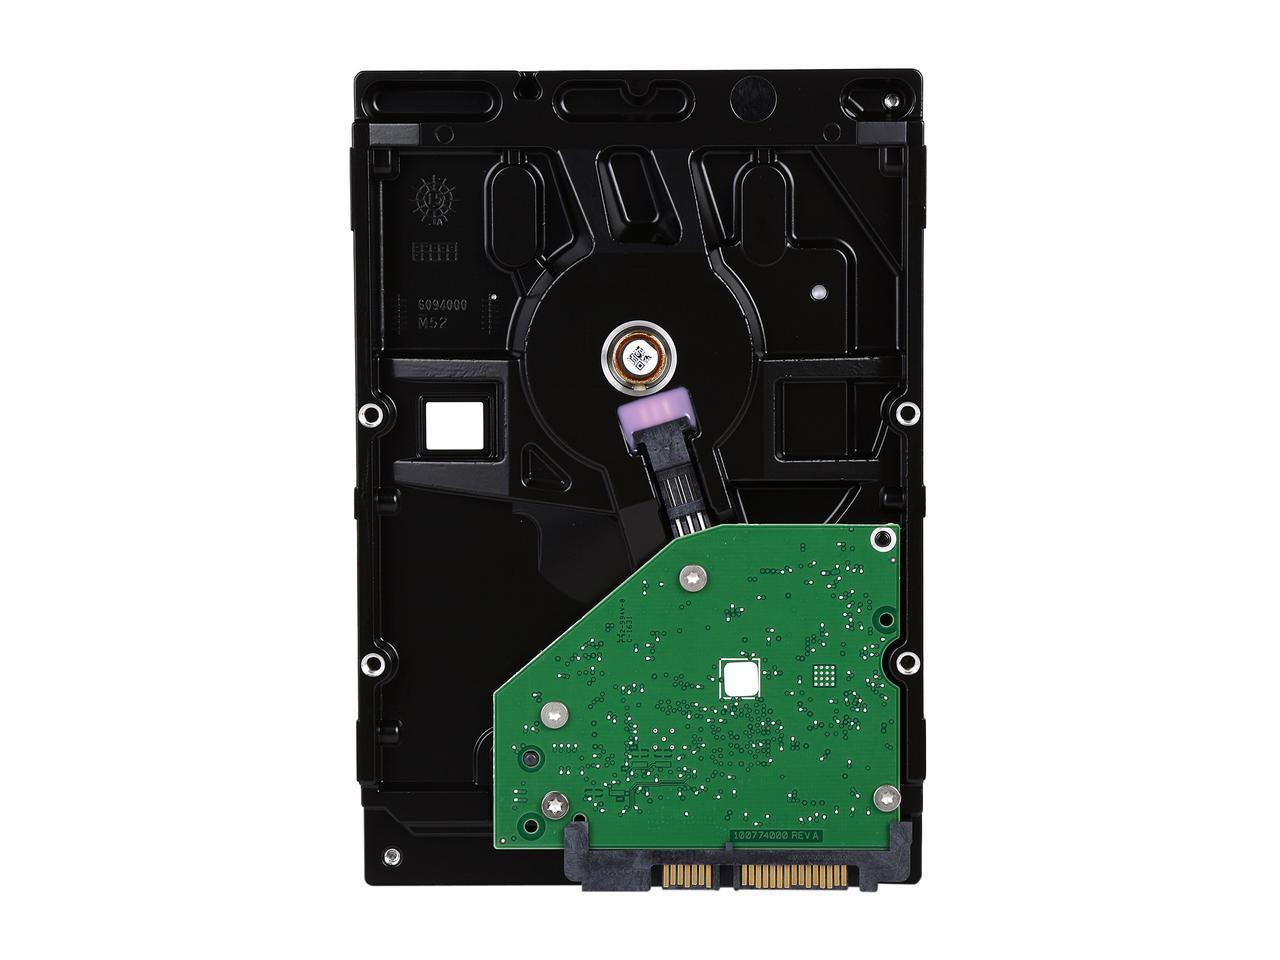 Хард диск SEAGATE SkyHawk ST1000VX005, 1TB, 64MB Cache, SATA 6.0Gb/s-3